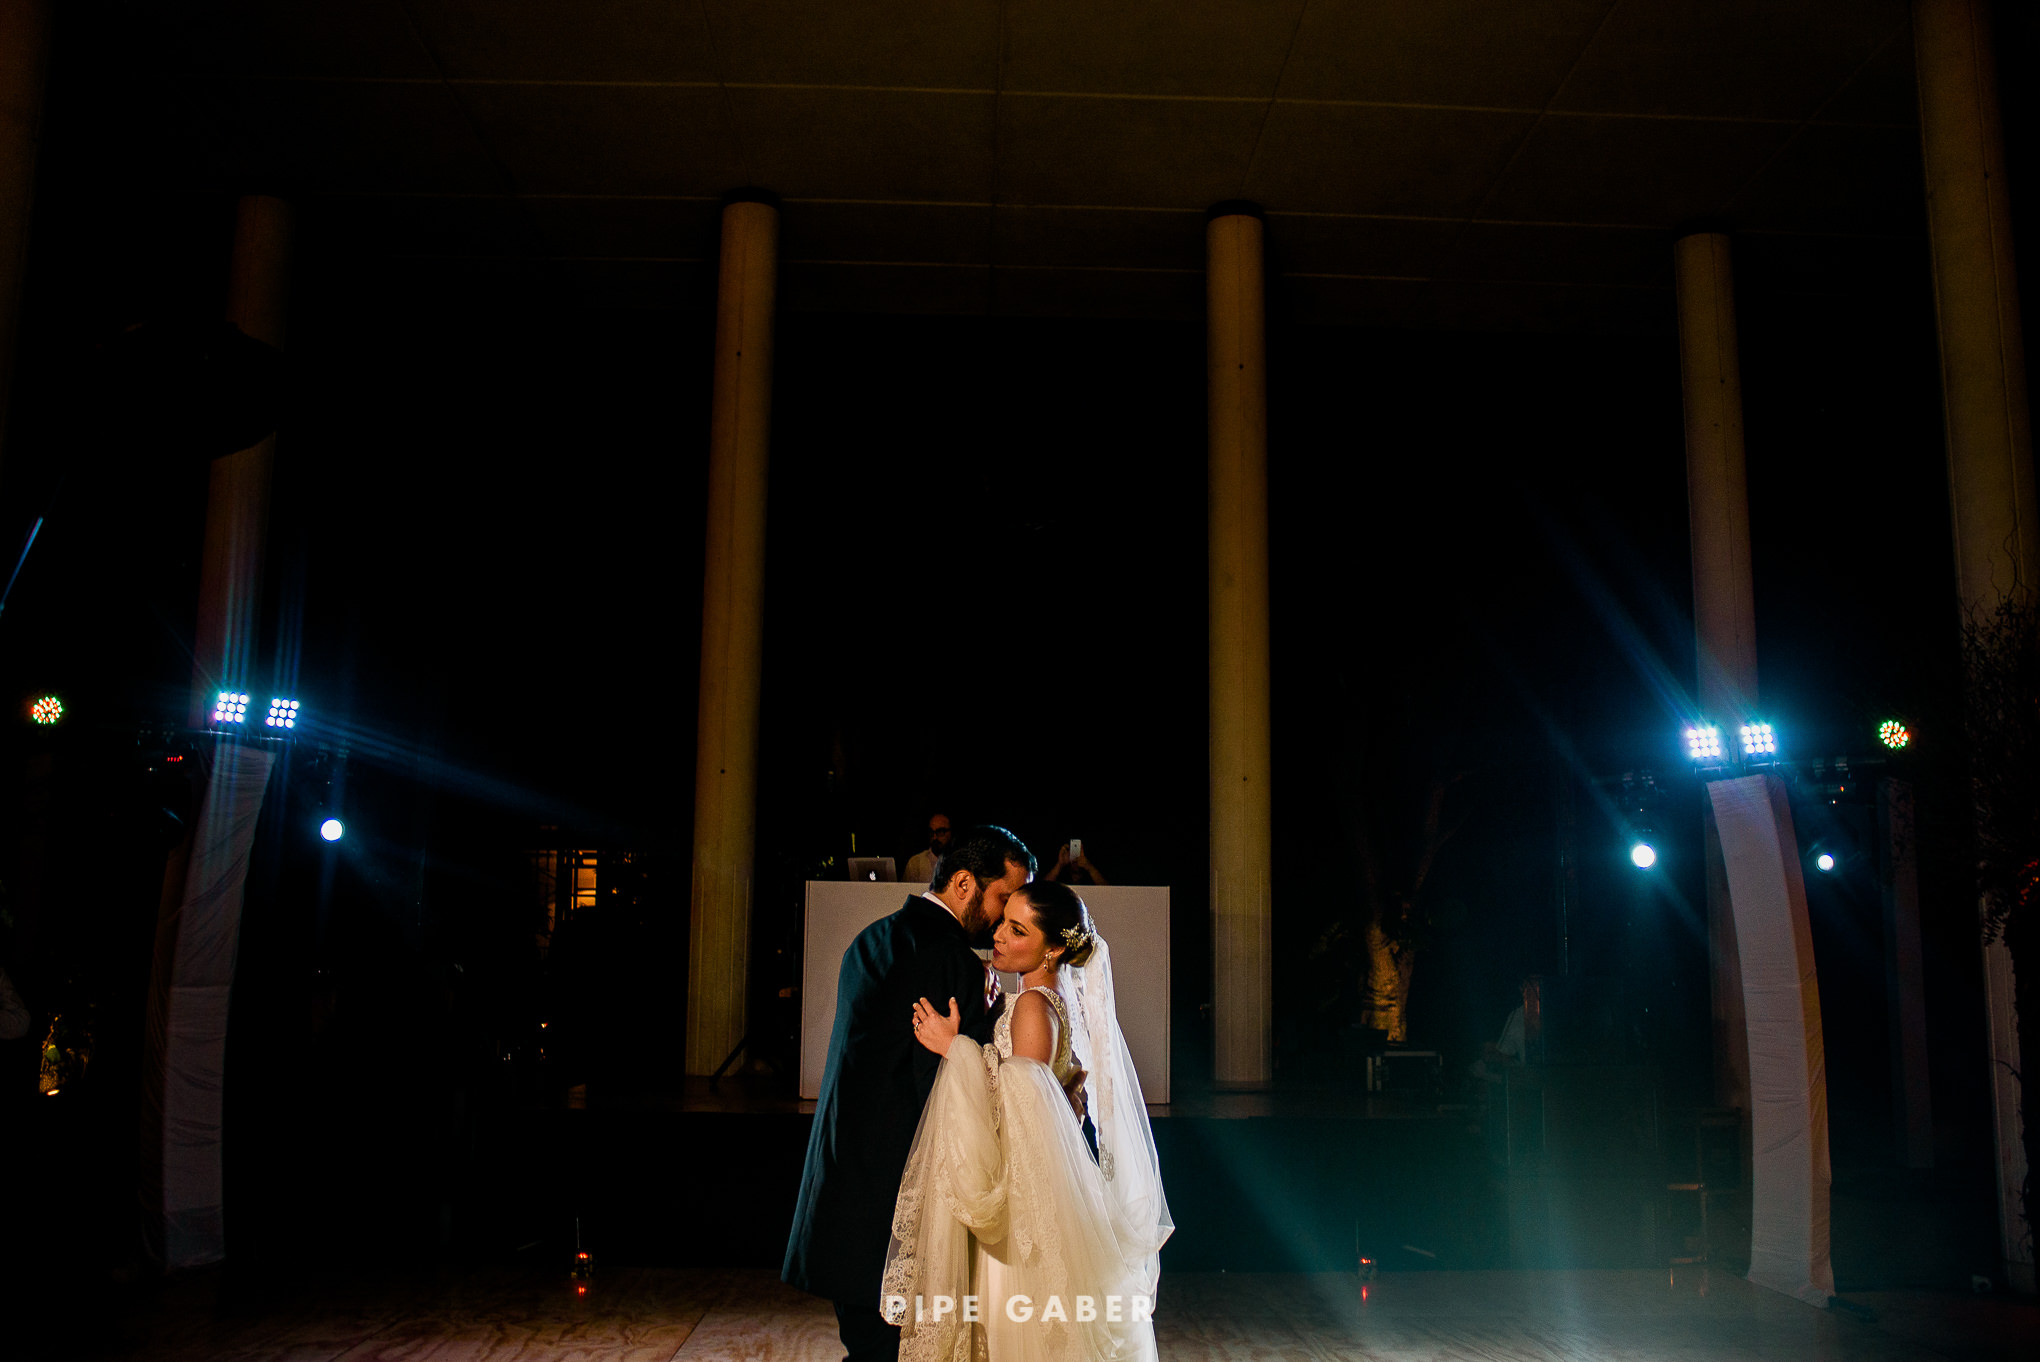 17_02_18_WEDDING_AIDITA_NEZBIT_MIGUEL_DOGRE_306_web.jpg